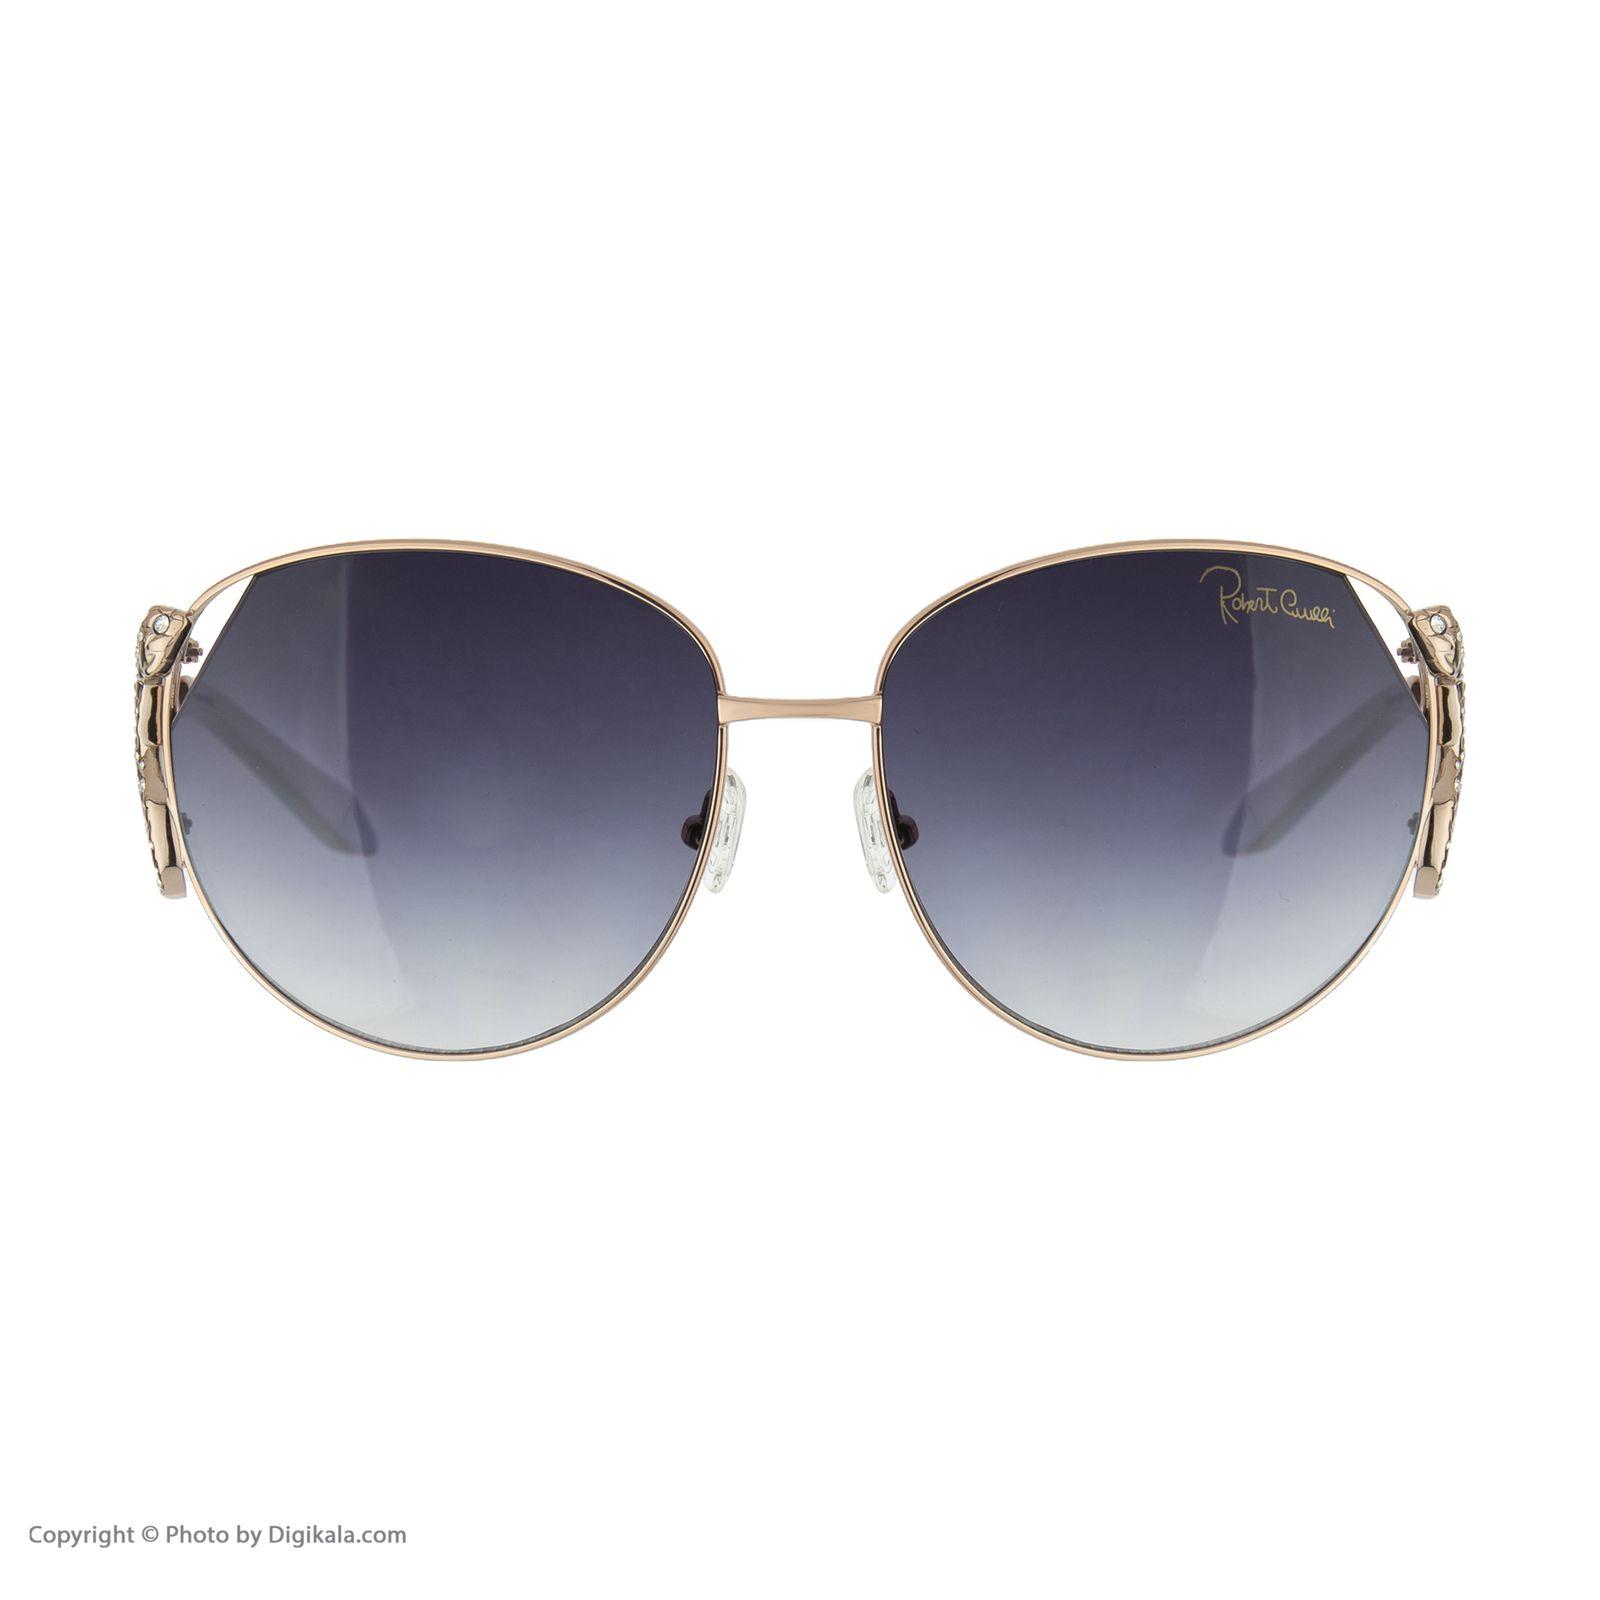 عینک آفتابی زنانه روبرتو کاوالی مدل 897 -  - 6